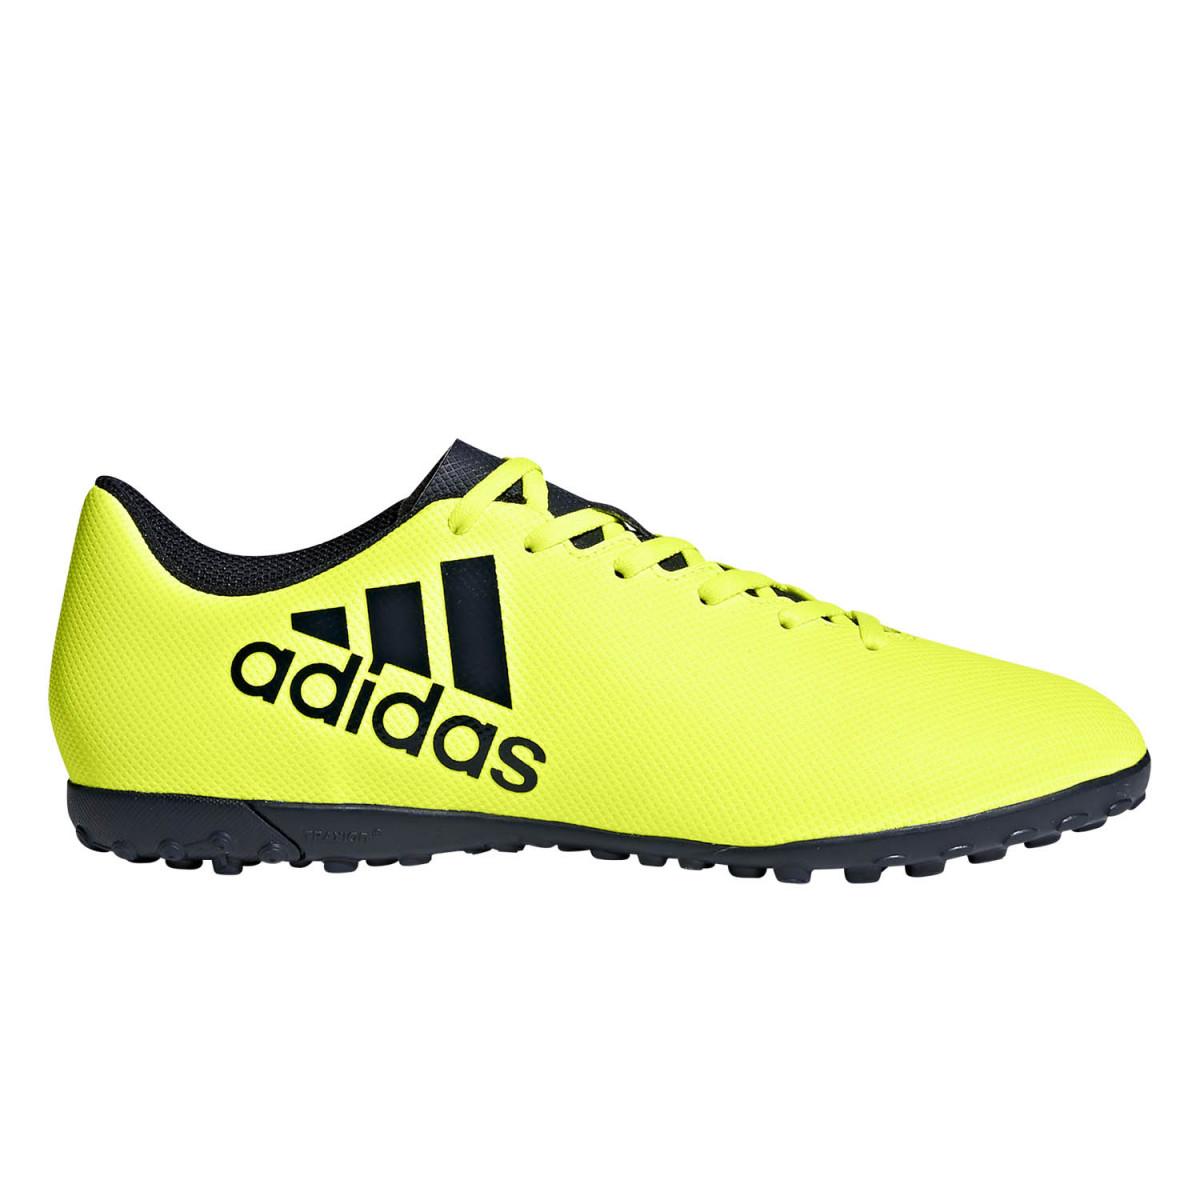 be53c5f50456f ... botines adidas x 17.4 tf